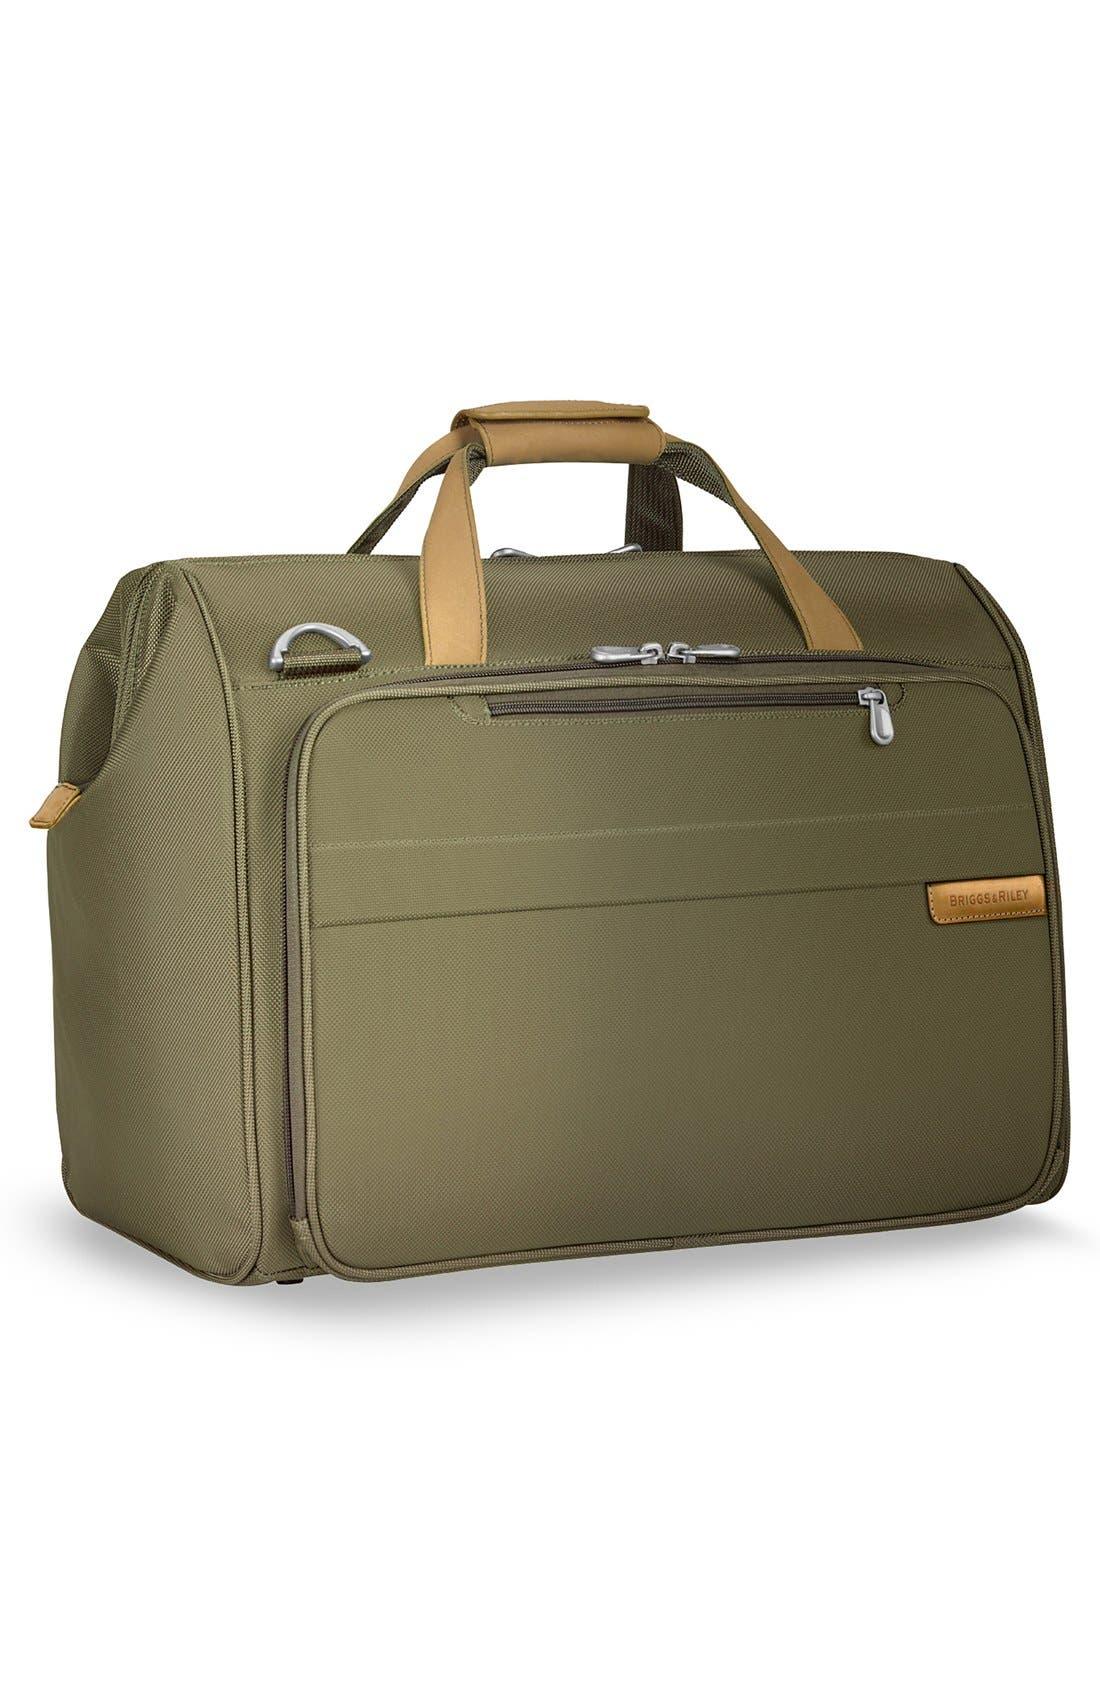 'Baseline' Duffel Bag,                             Alternate thumbnail 4, color,                             Olive Green